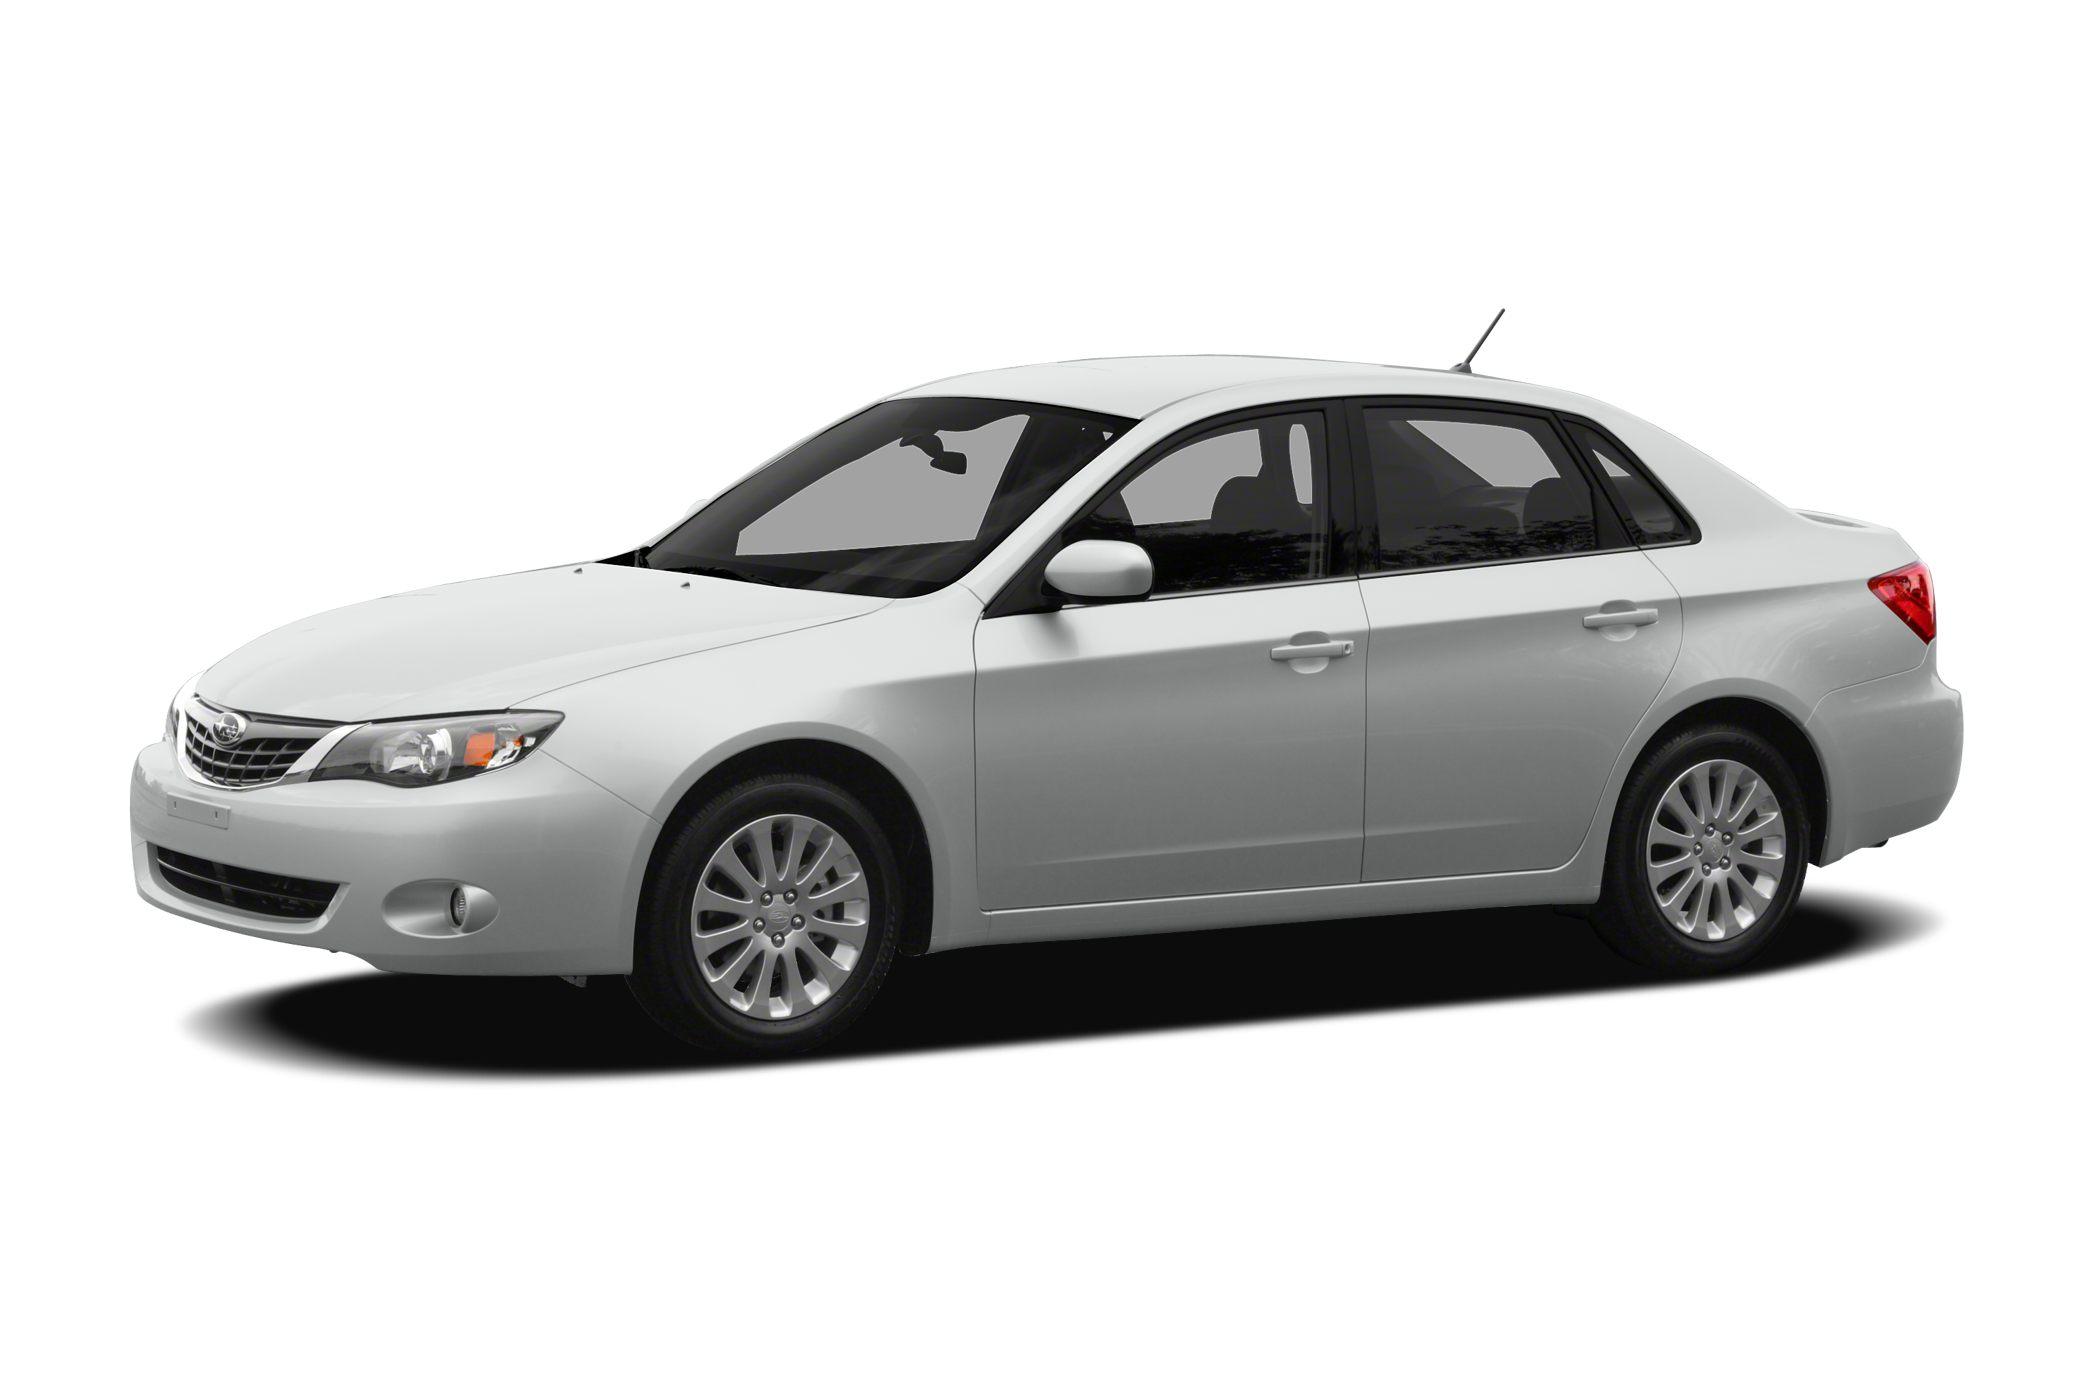 2011 Subaru Impreza 2.5 I Premium Sedan for sale in Tunnelton for $12,000 with 83,642 miles.